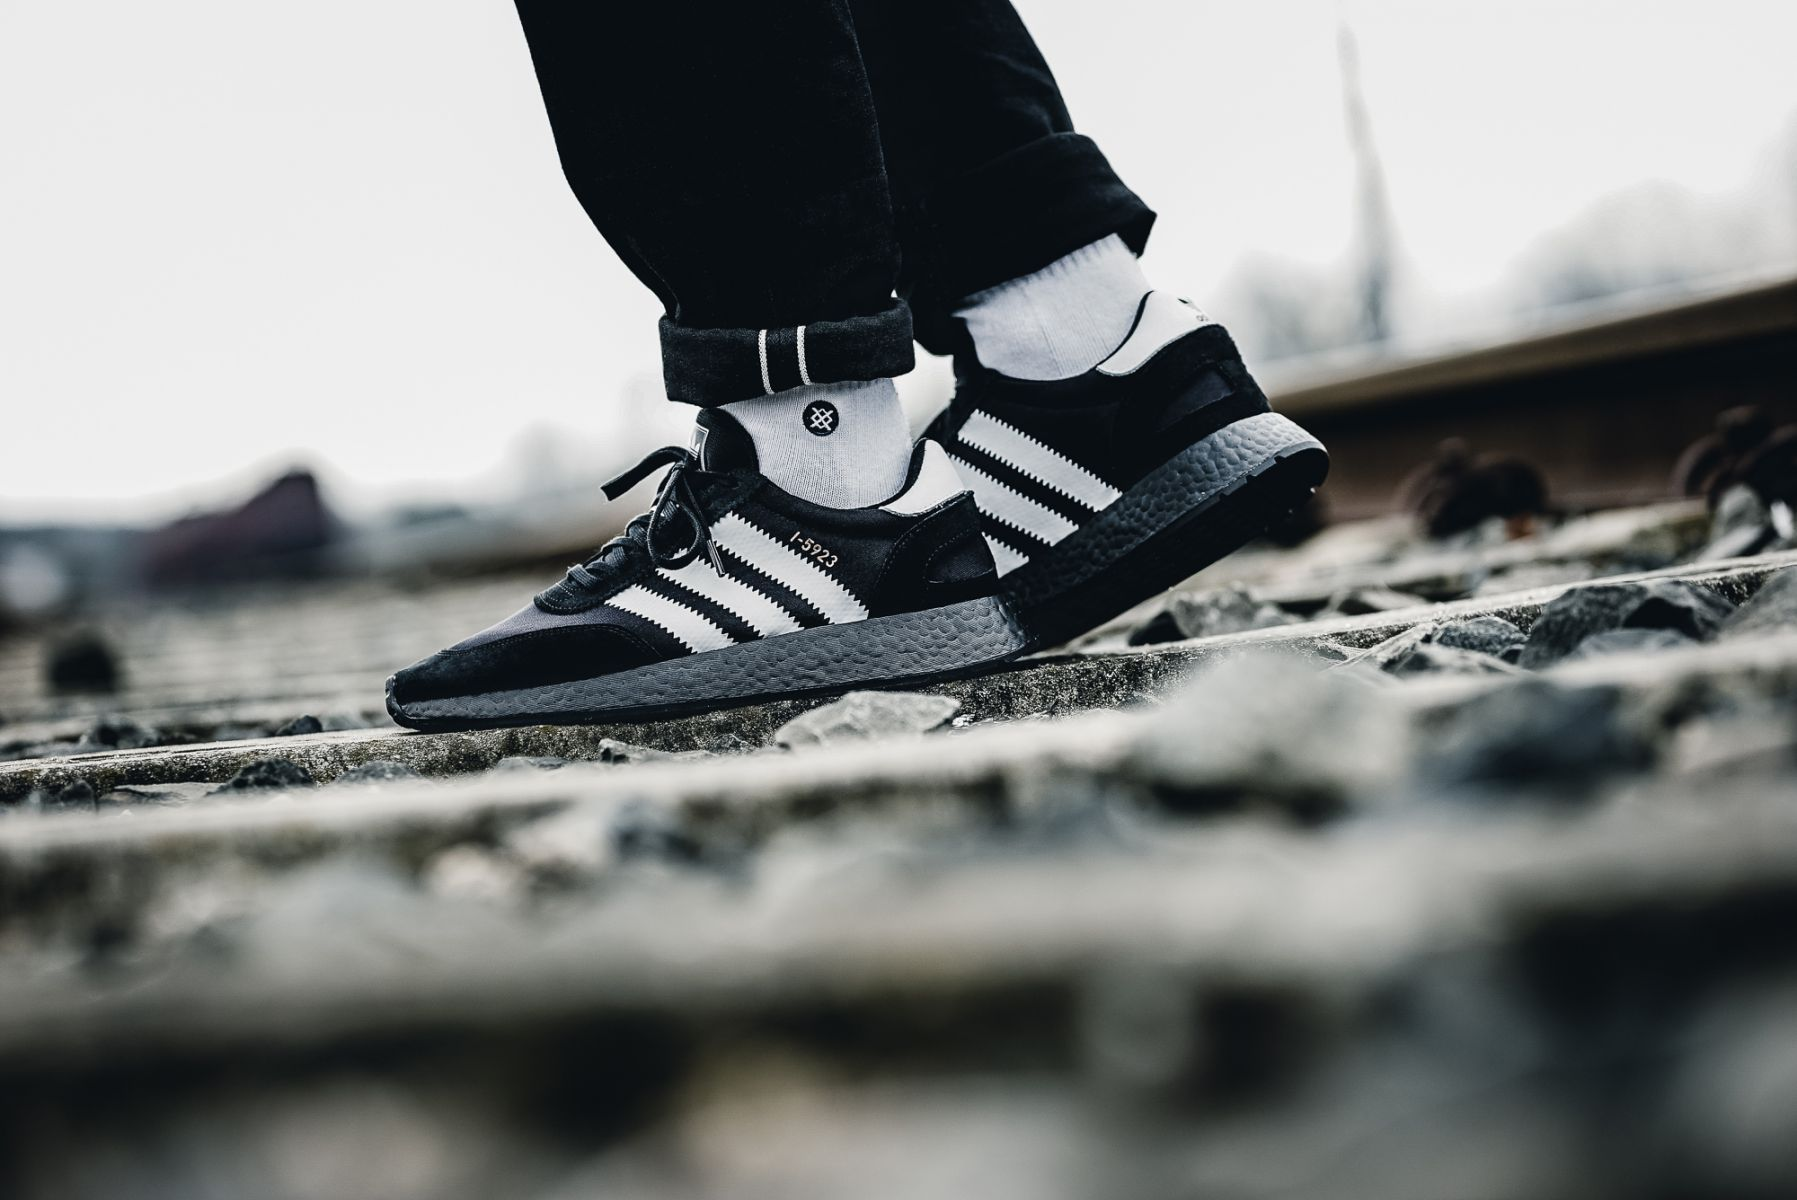 best cheap d08a3 662c0 adidas Iniki Runner Black Boost - Where to buy online. Stil, Laufen, Neue  Wege, Kicks, Silhouette, Ootd ...